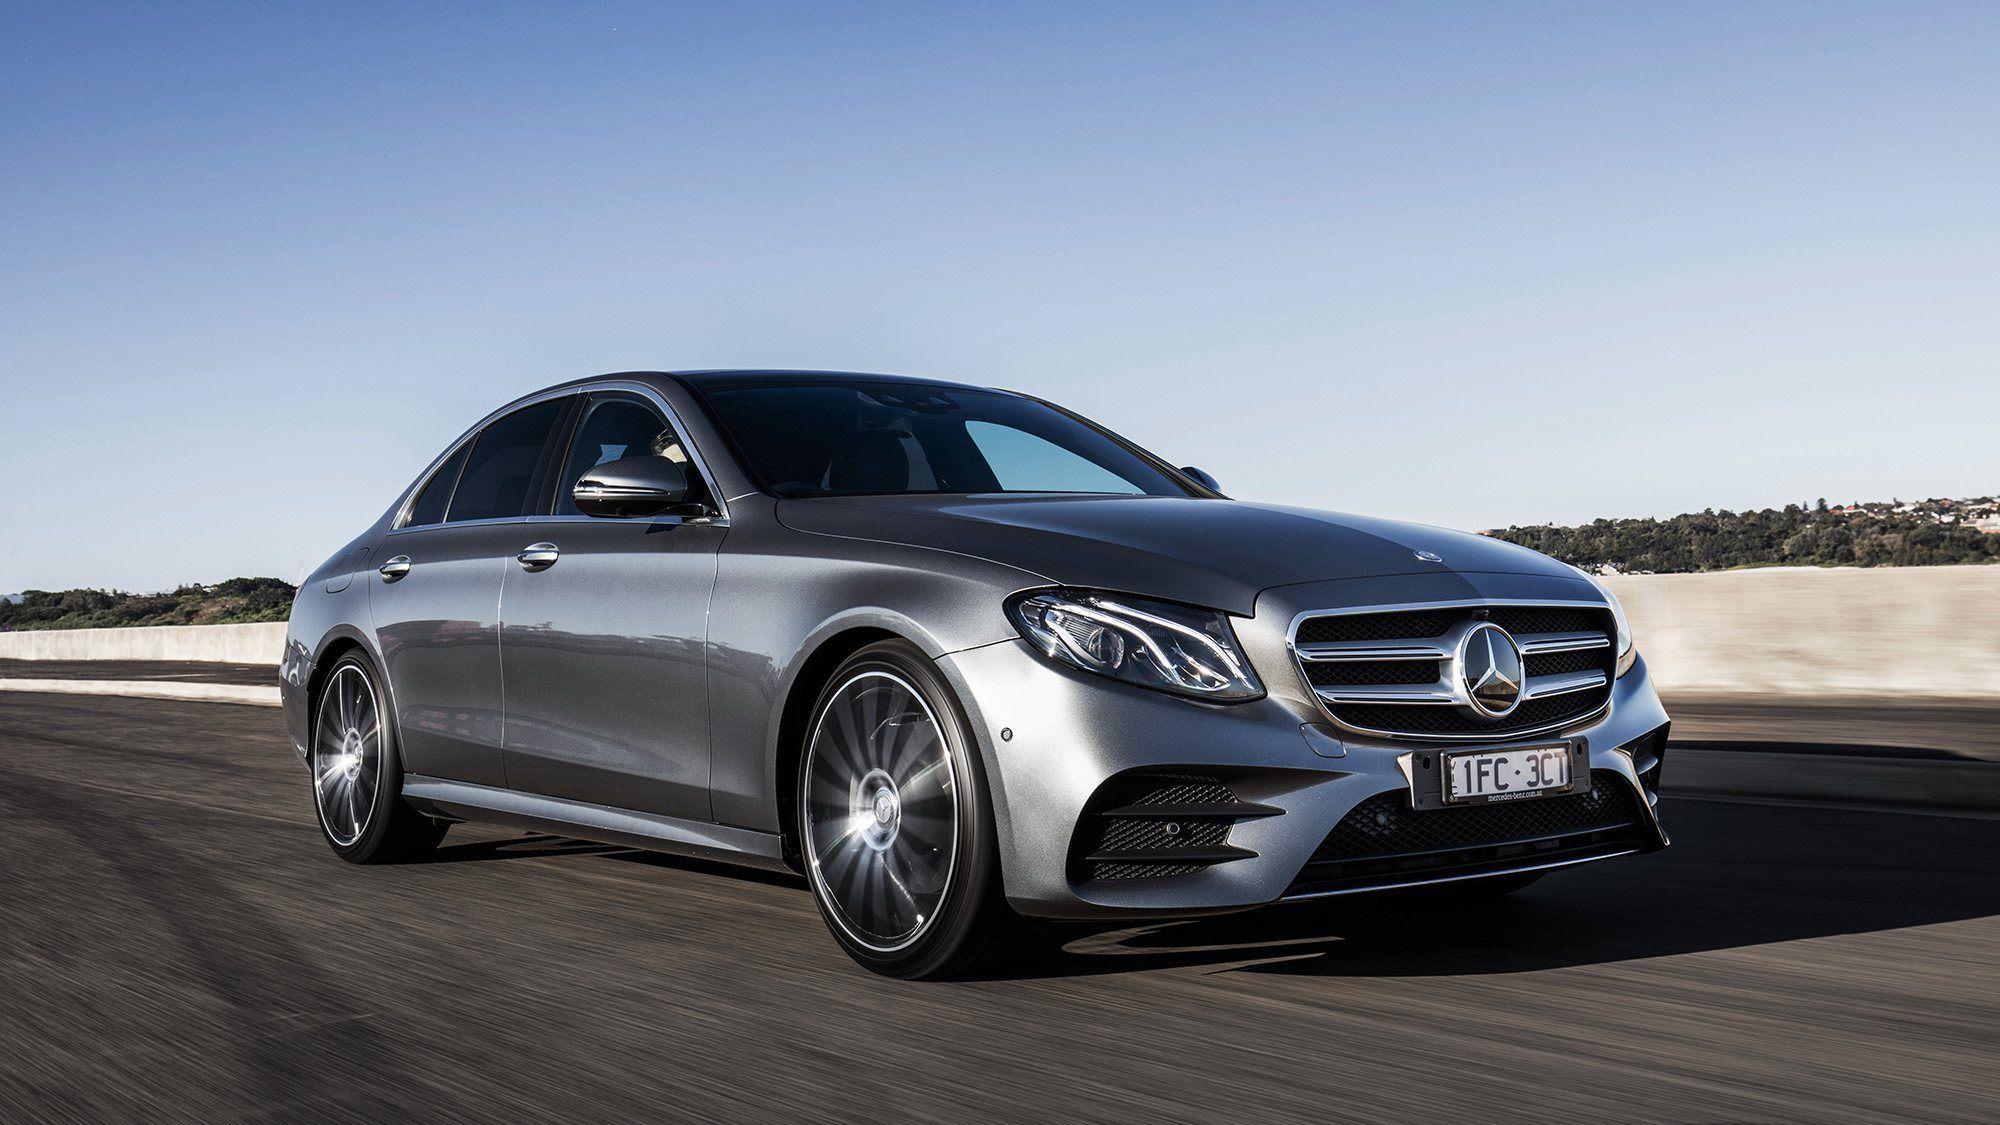 2020 Mercedes E Class Price And Review Mercedes E Class Benz E